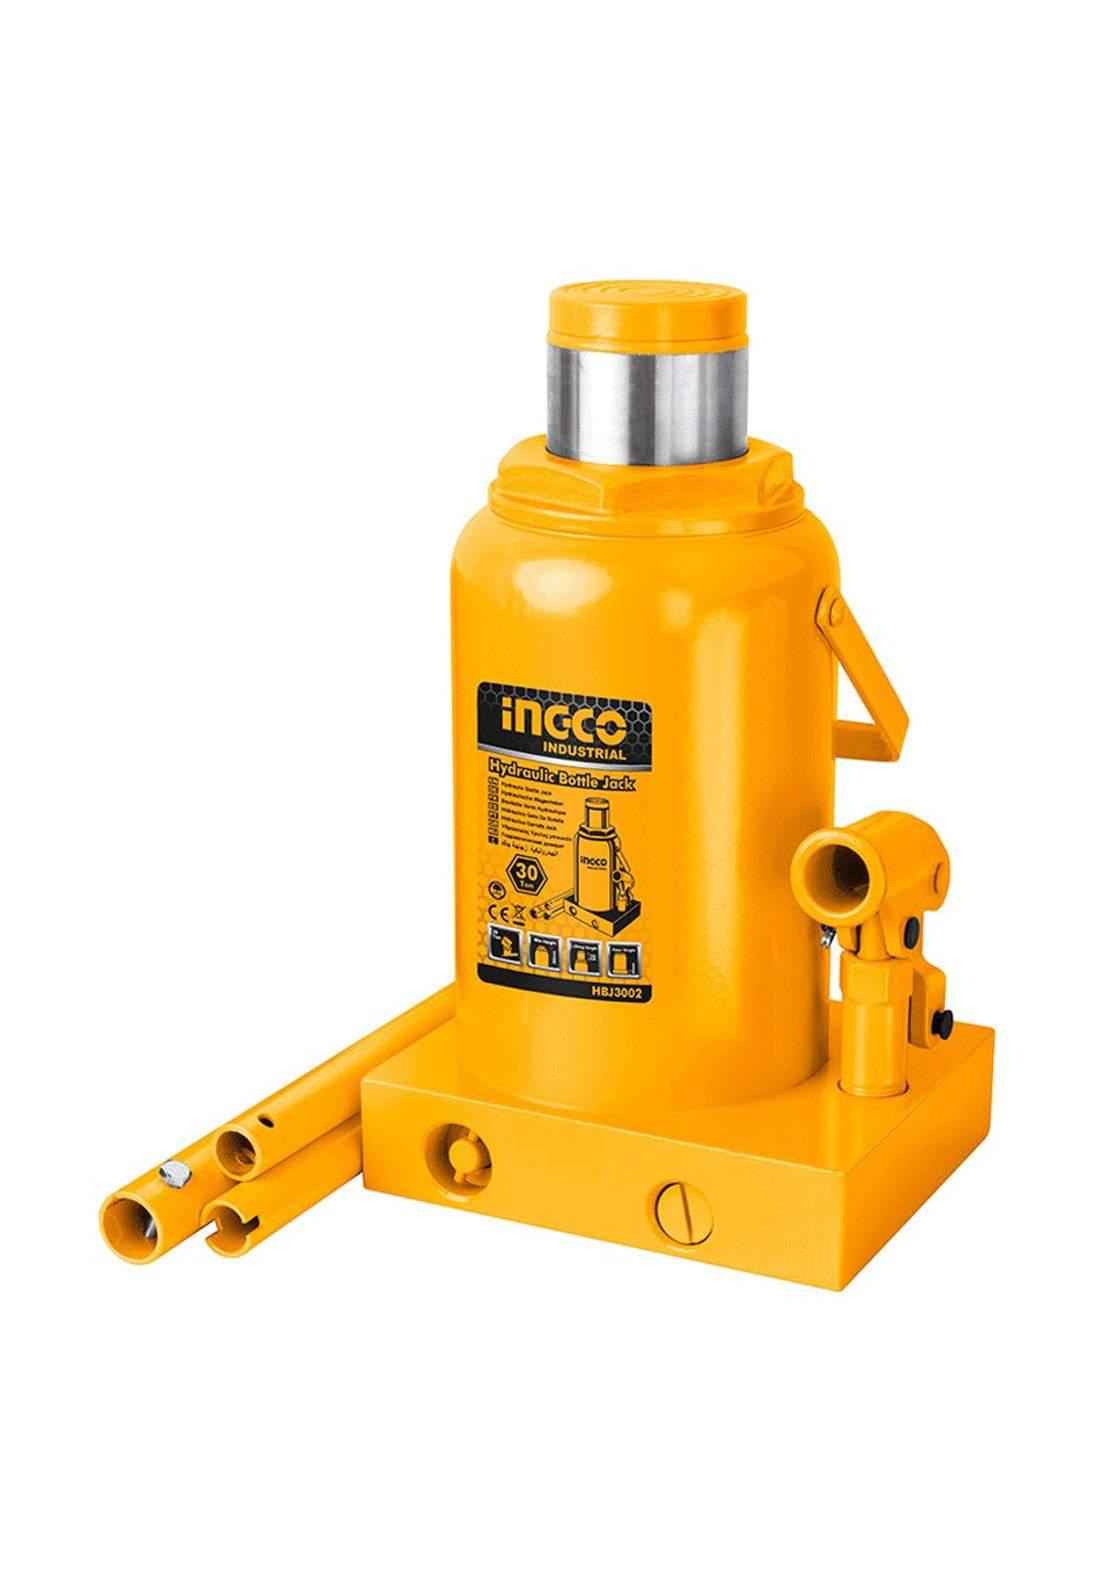 Ingco HBJ3002 Hydraulic Jack 30 Tons جك هيدروليك